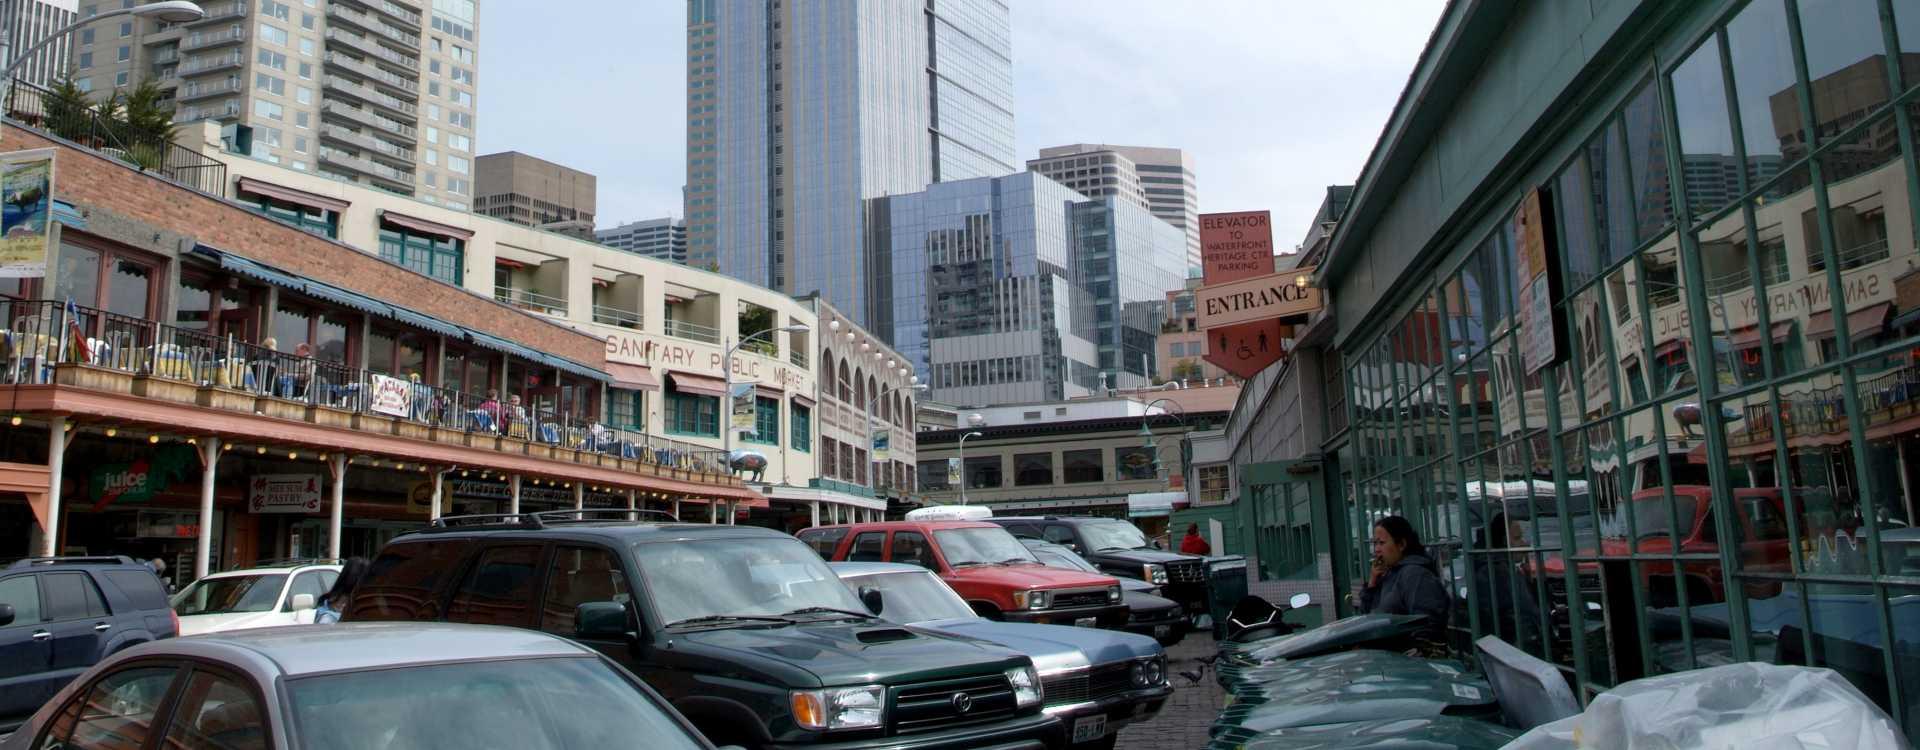 Pike_Place_Market-2.jpg